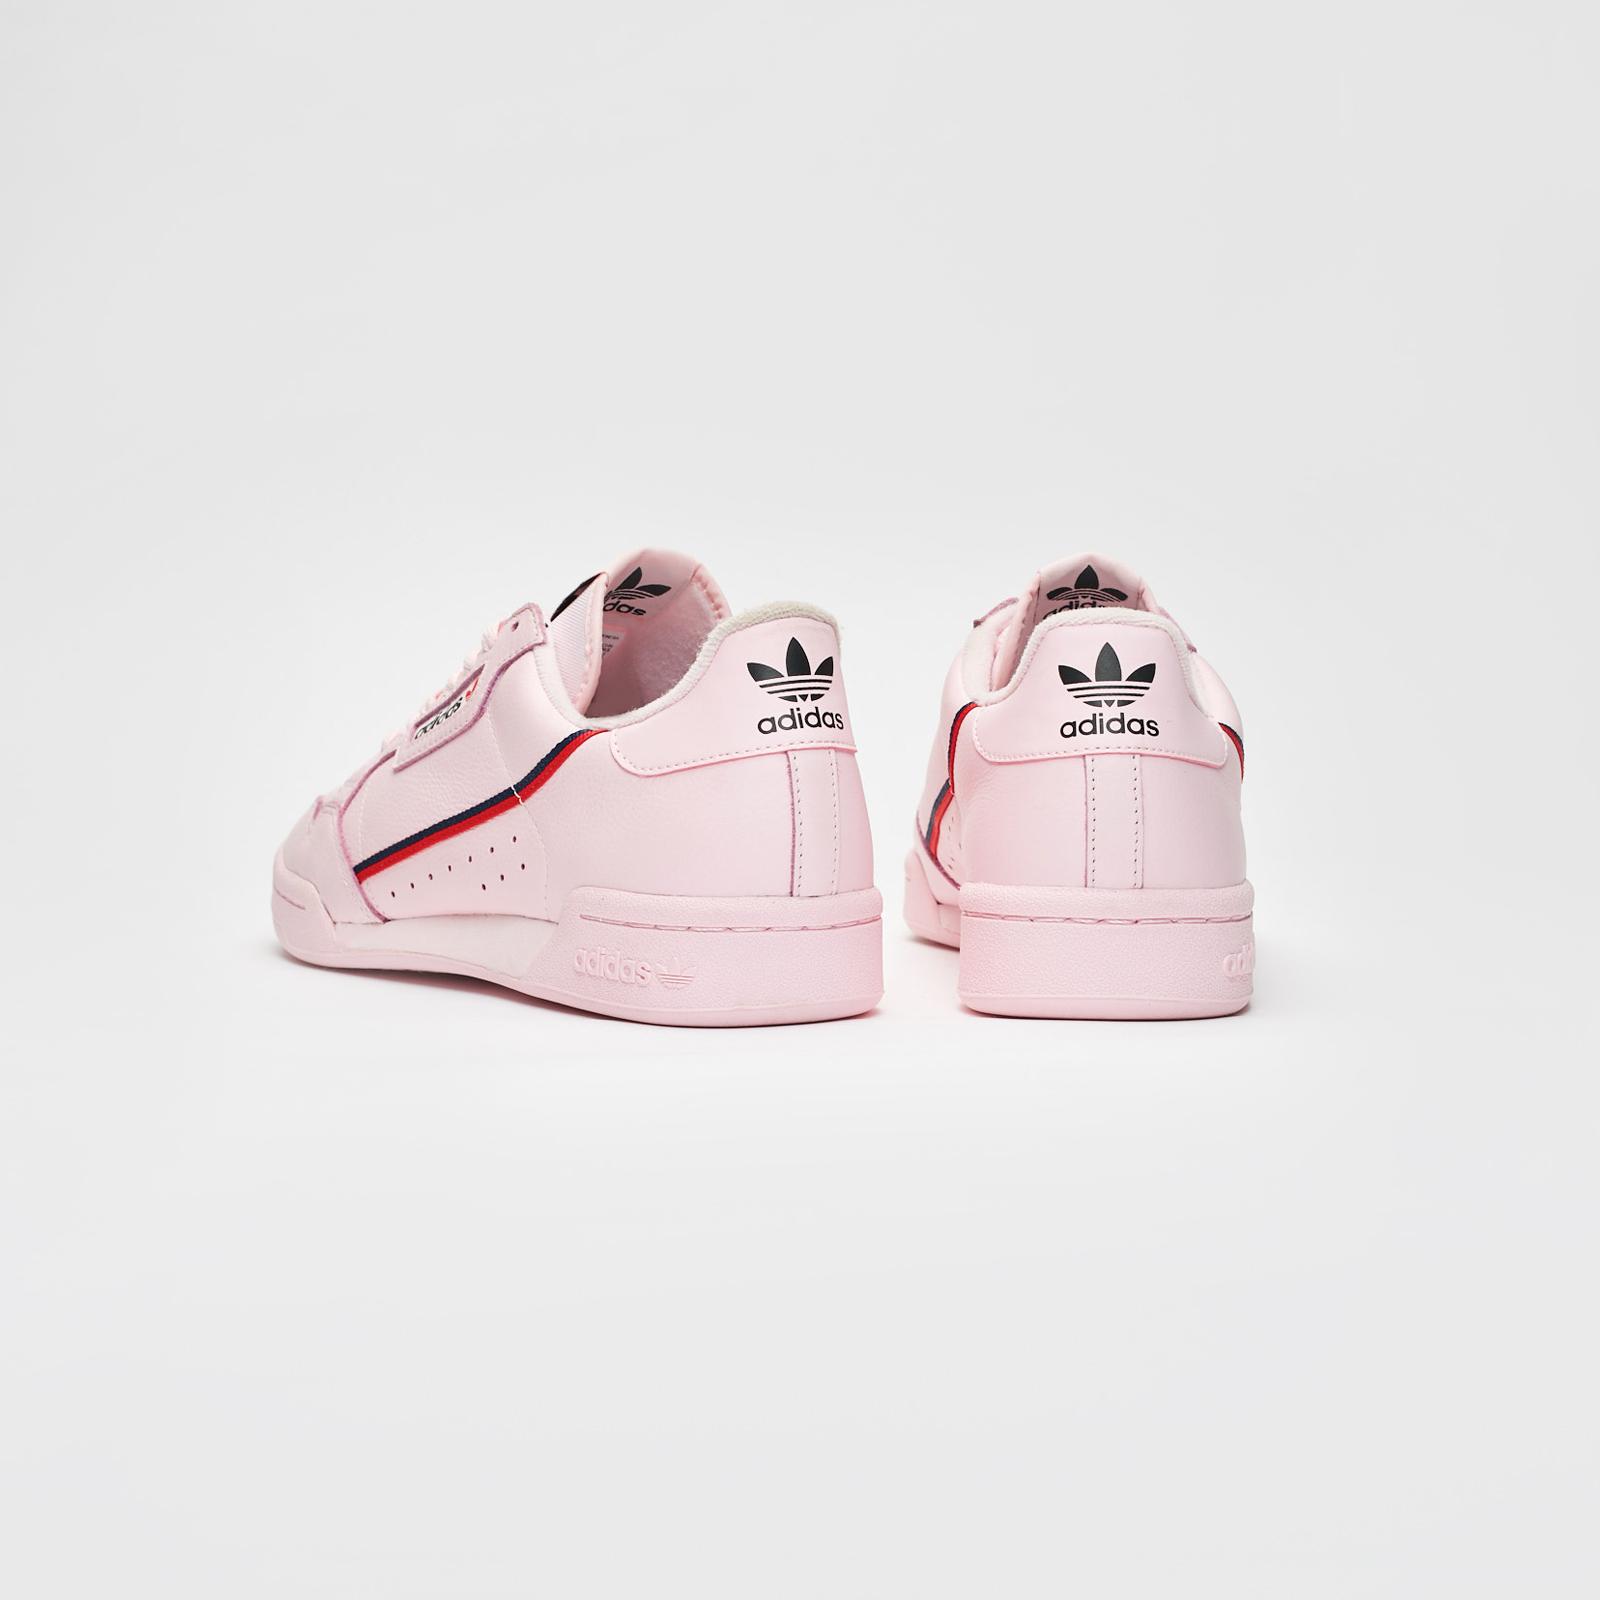 Adidas Continental 80 B41679 Sneakersnstuff Sneakers